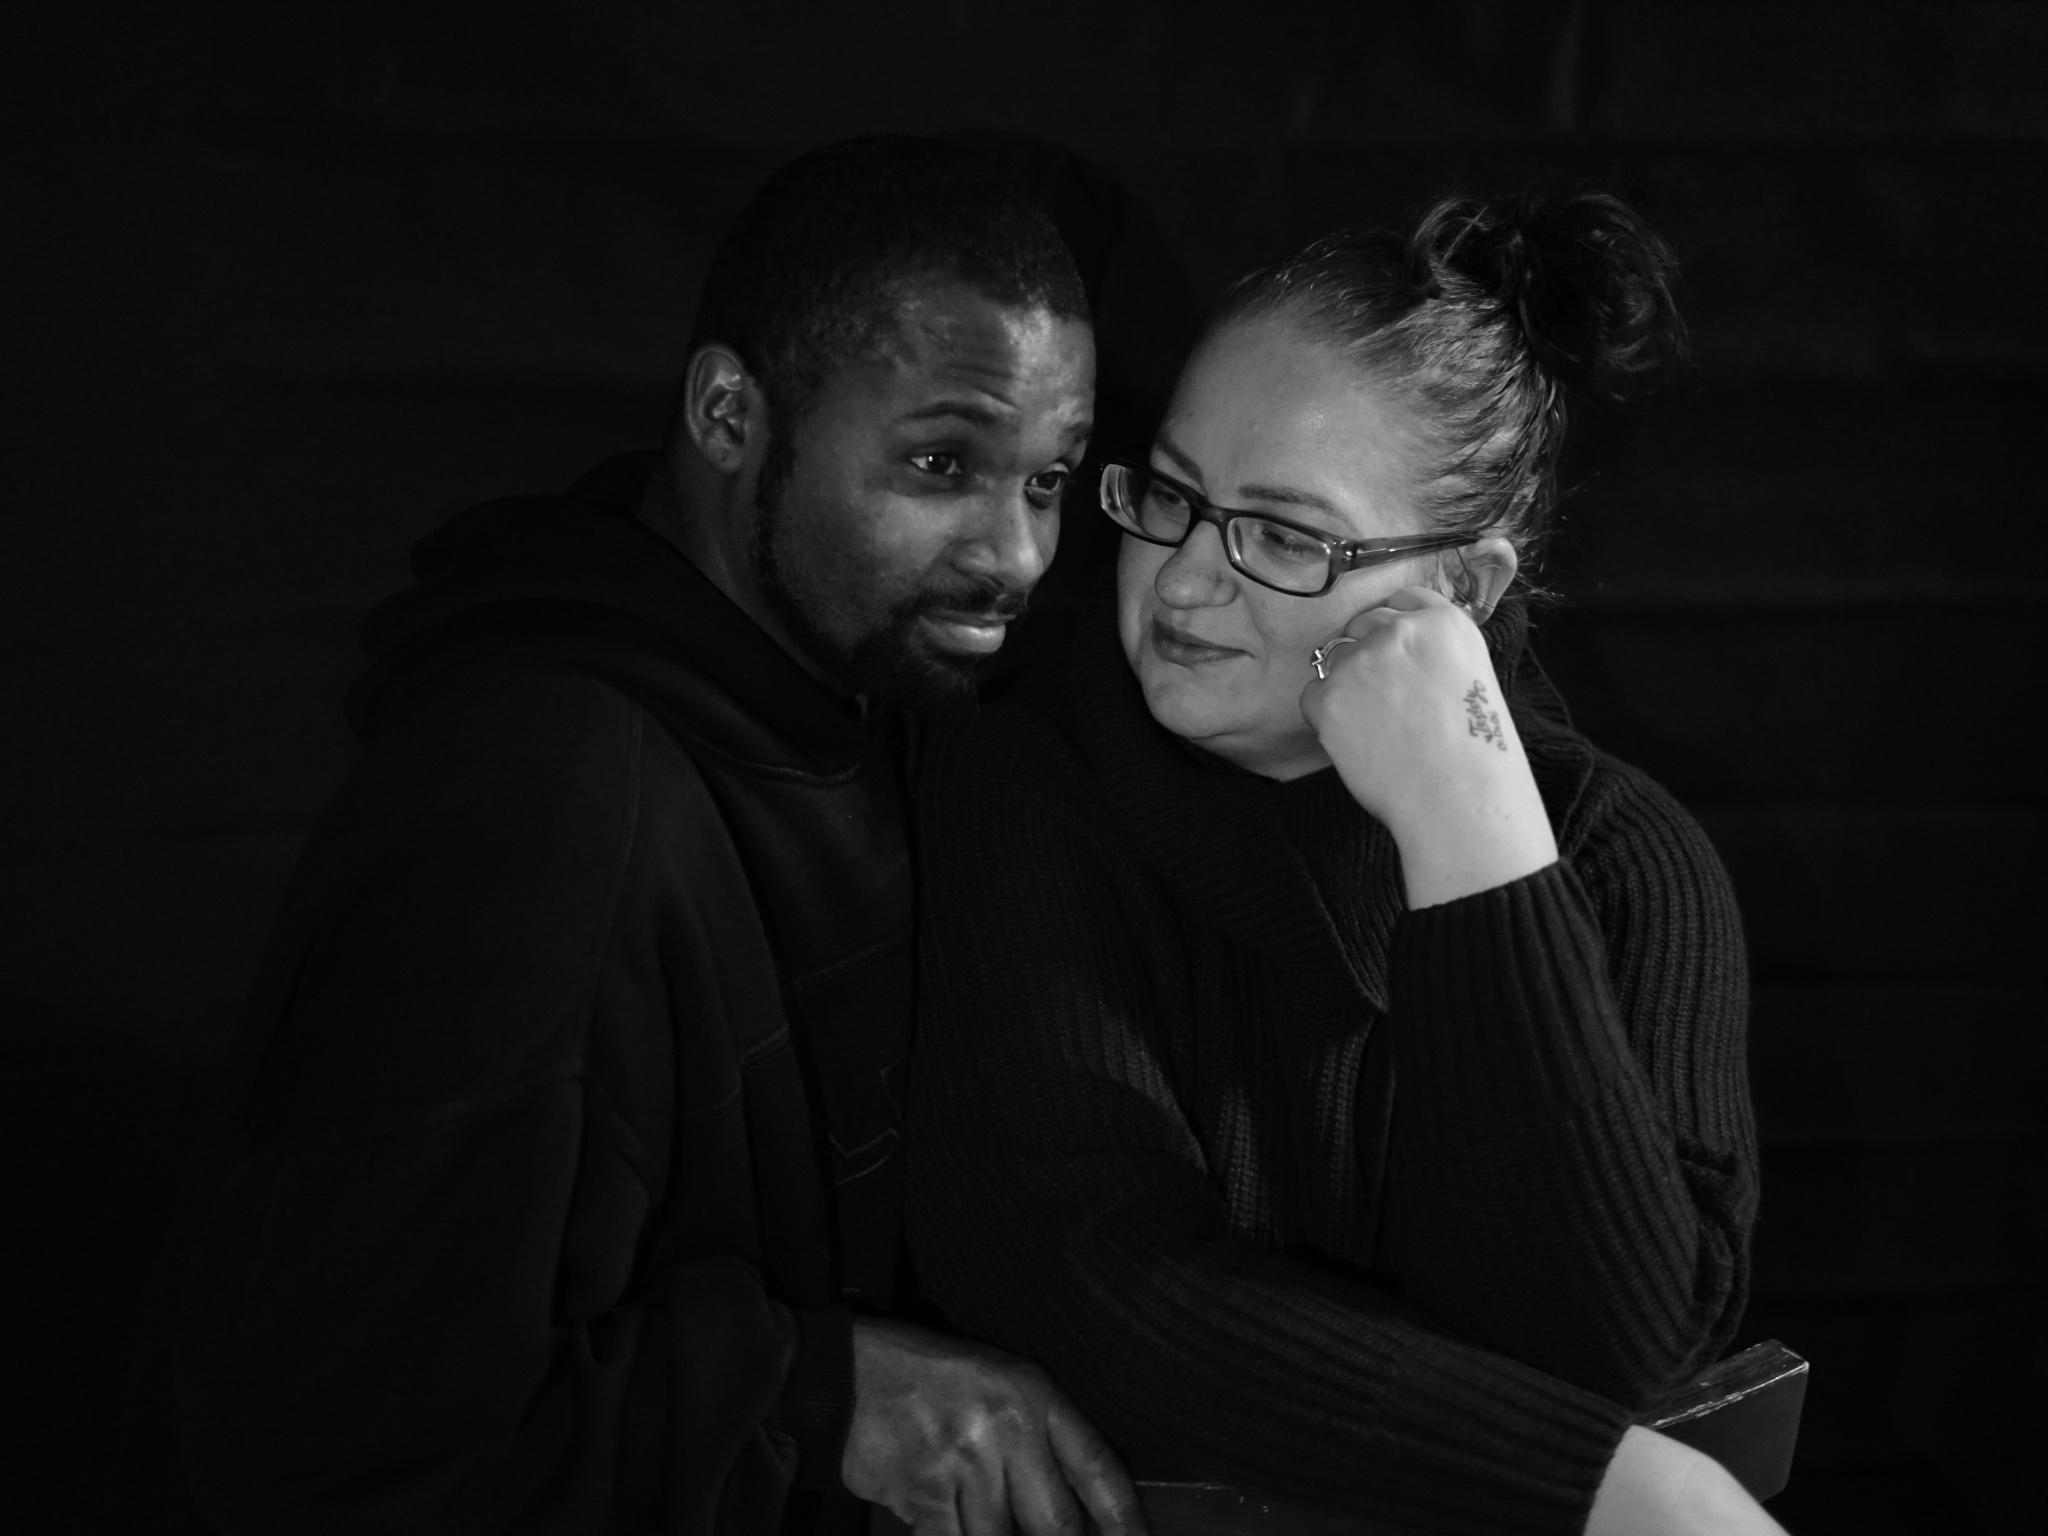 Jacqueline mit ihrem Mann. Foto: Jacqueline Filmore